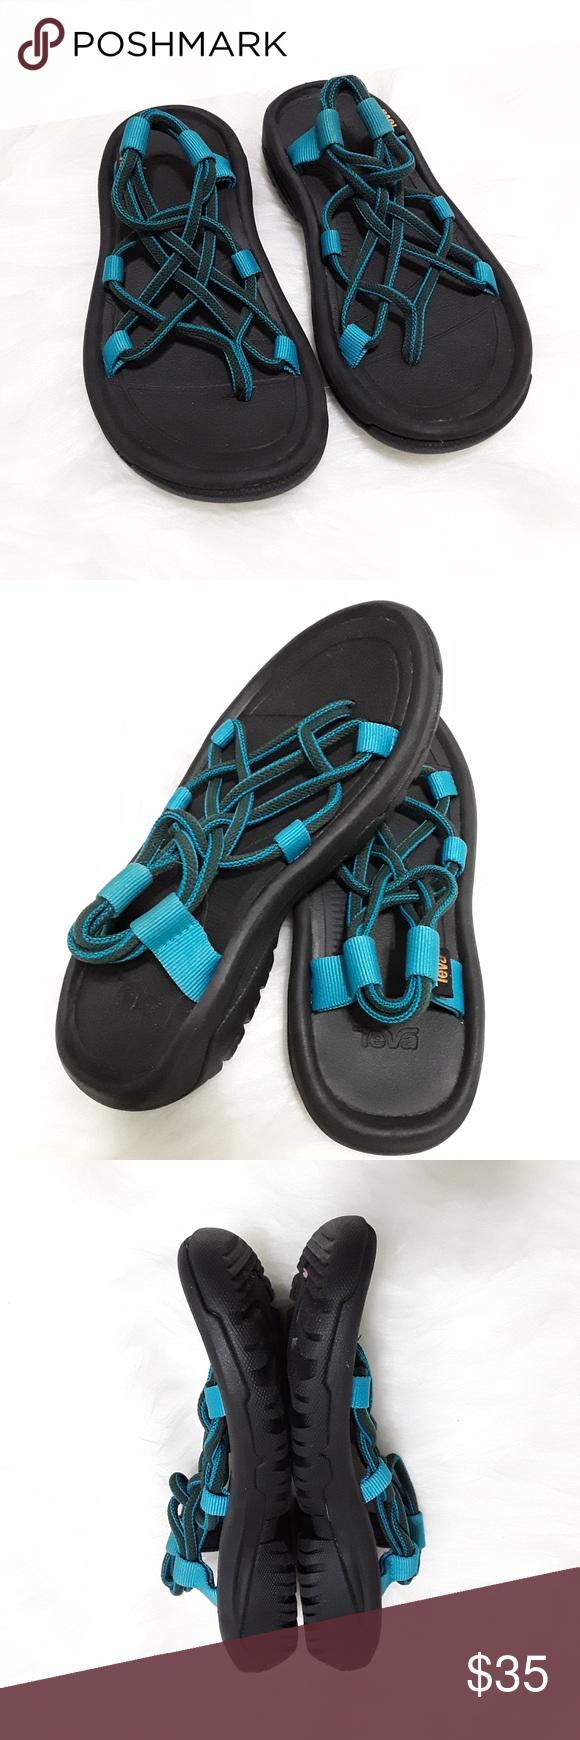 Teva Hurricane Xlt Infinity Arctic Forest Sandal 5 Teva Womens Flip Flop Sandals